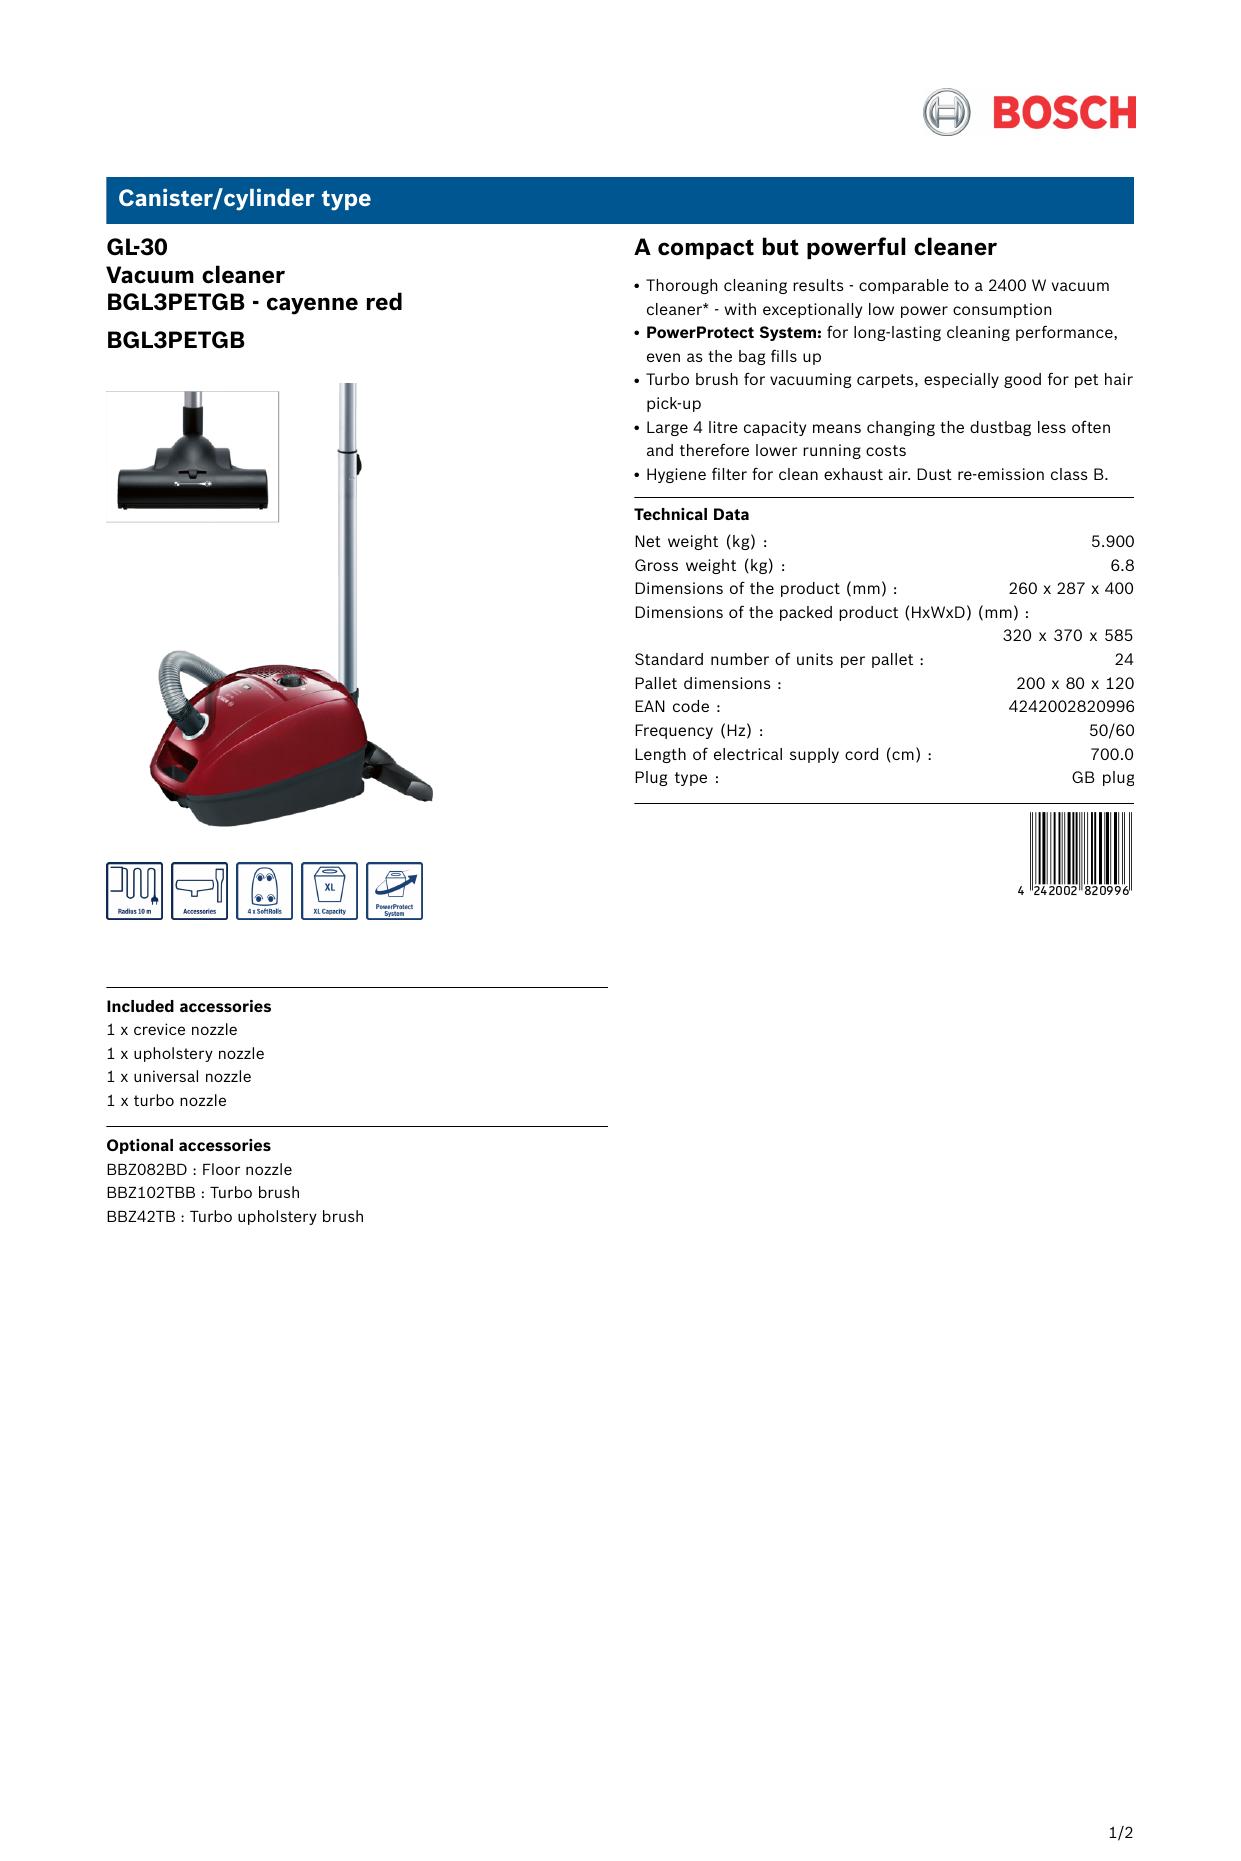 Bosch Bgl3petgb Red Gl 30 Bagged Vacuum Cleaner User Manual Manualzz